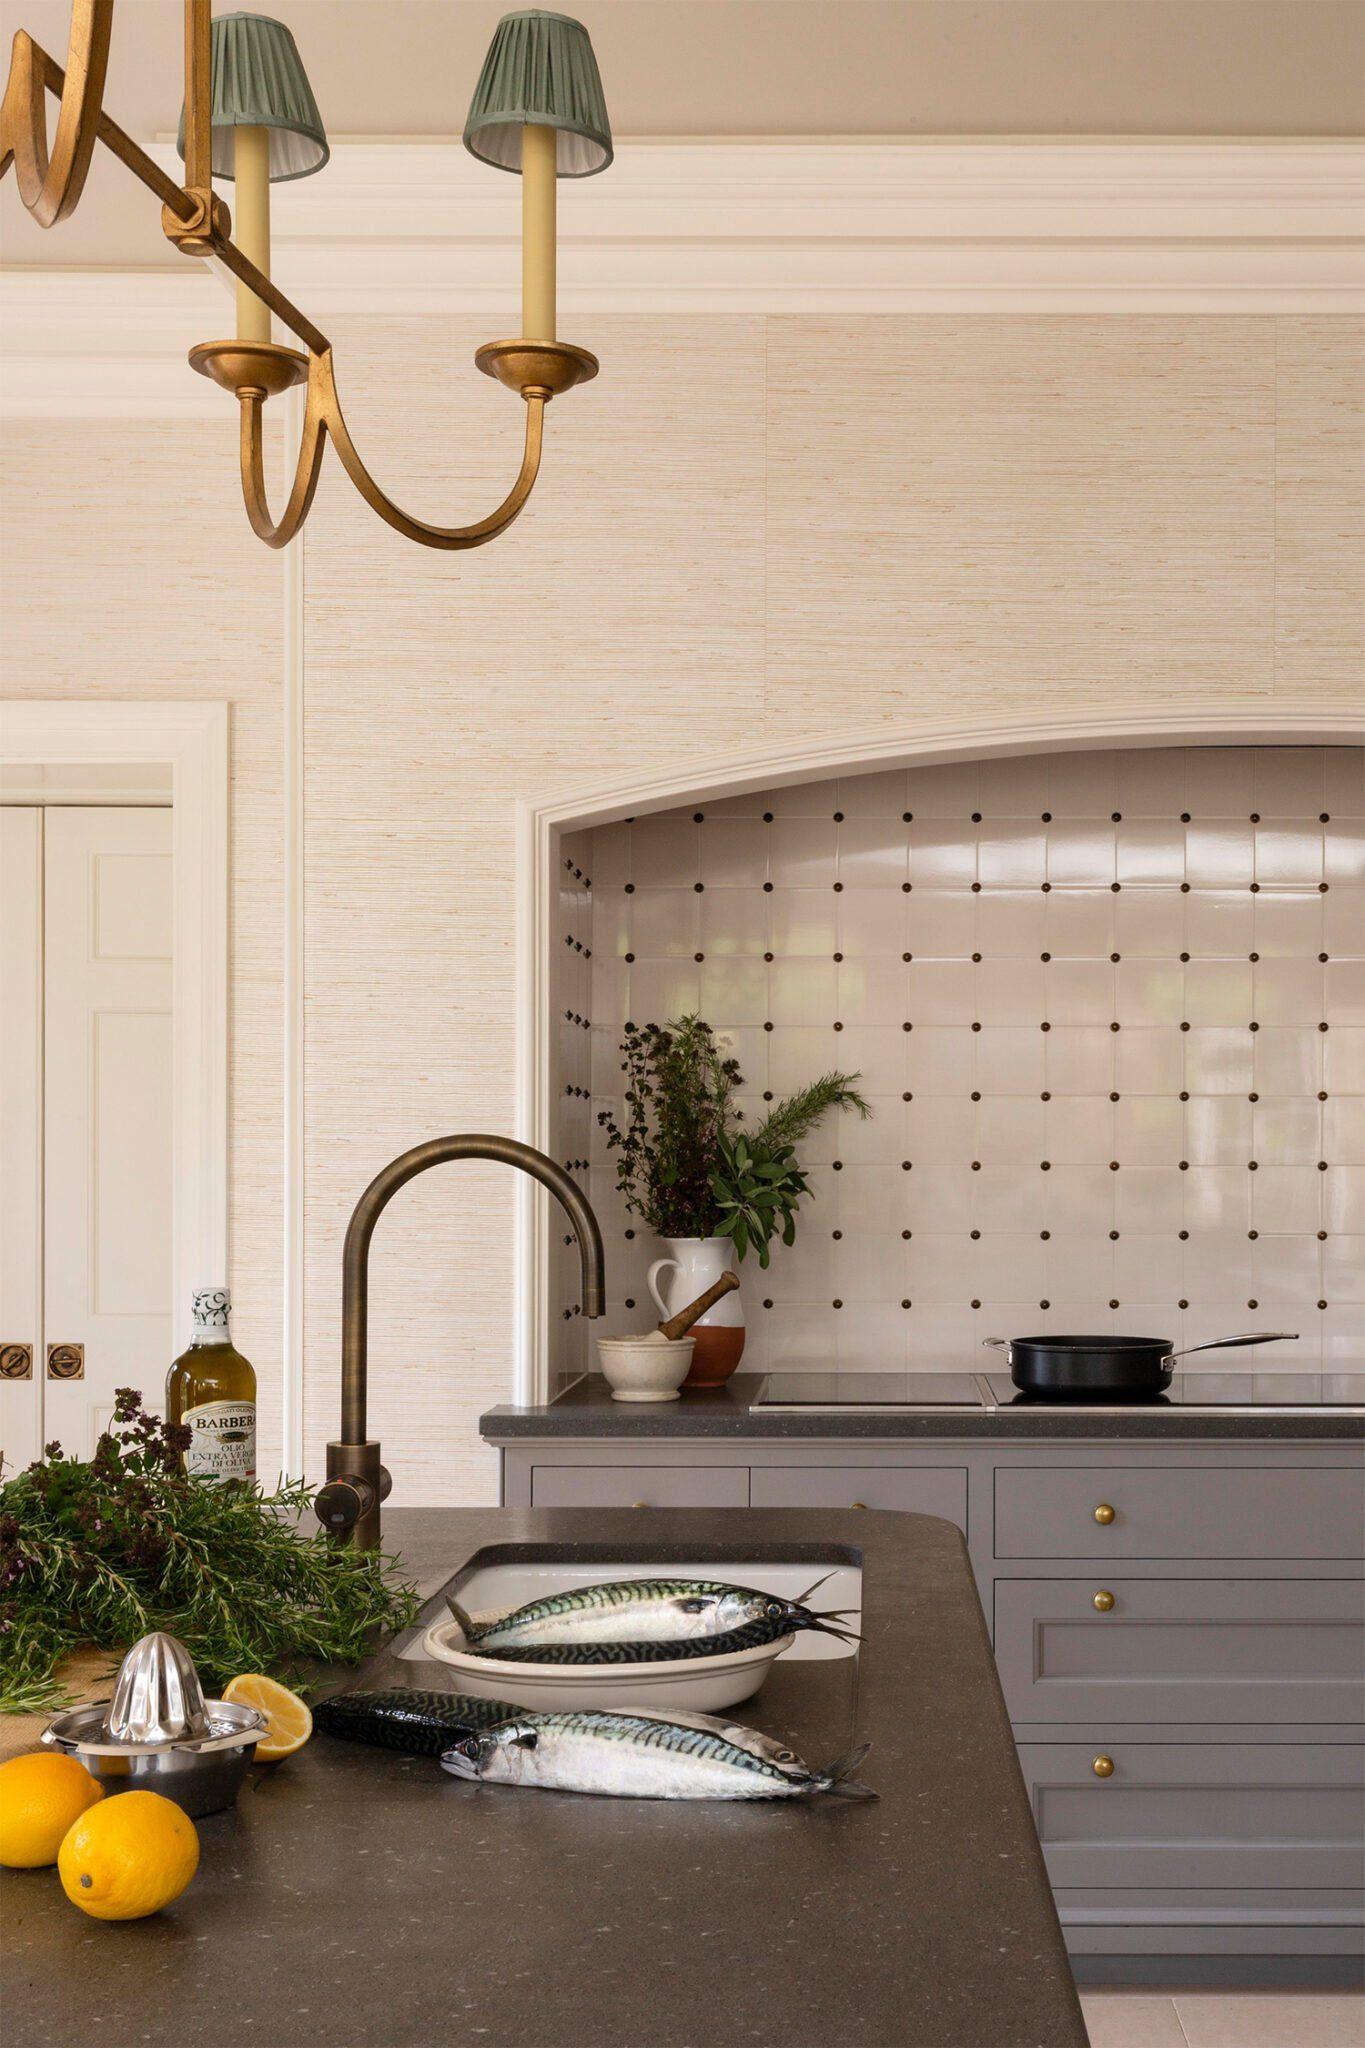 Classic English kitchen design details